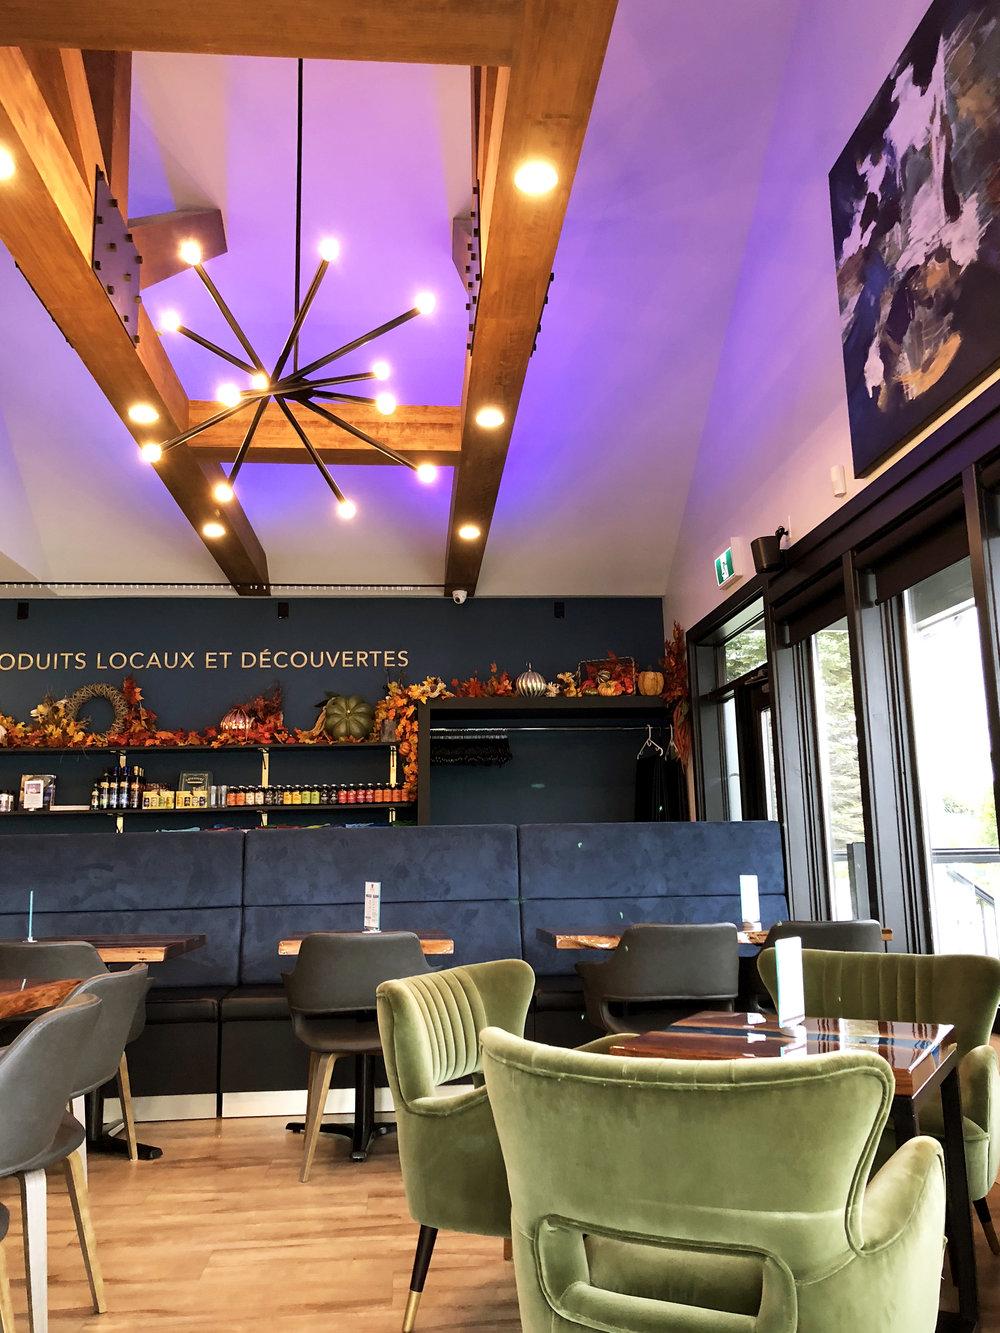 ecluse-interior-lights-ceiling-beams.jpg